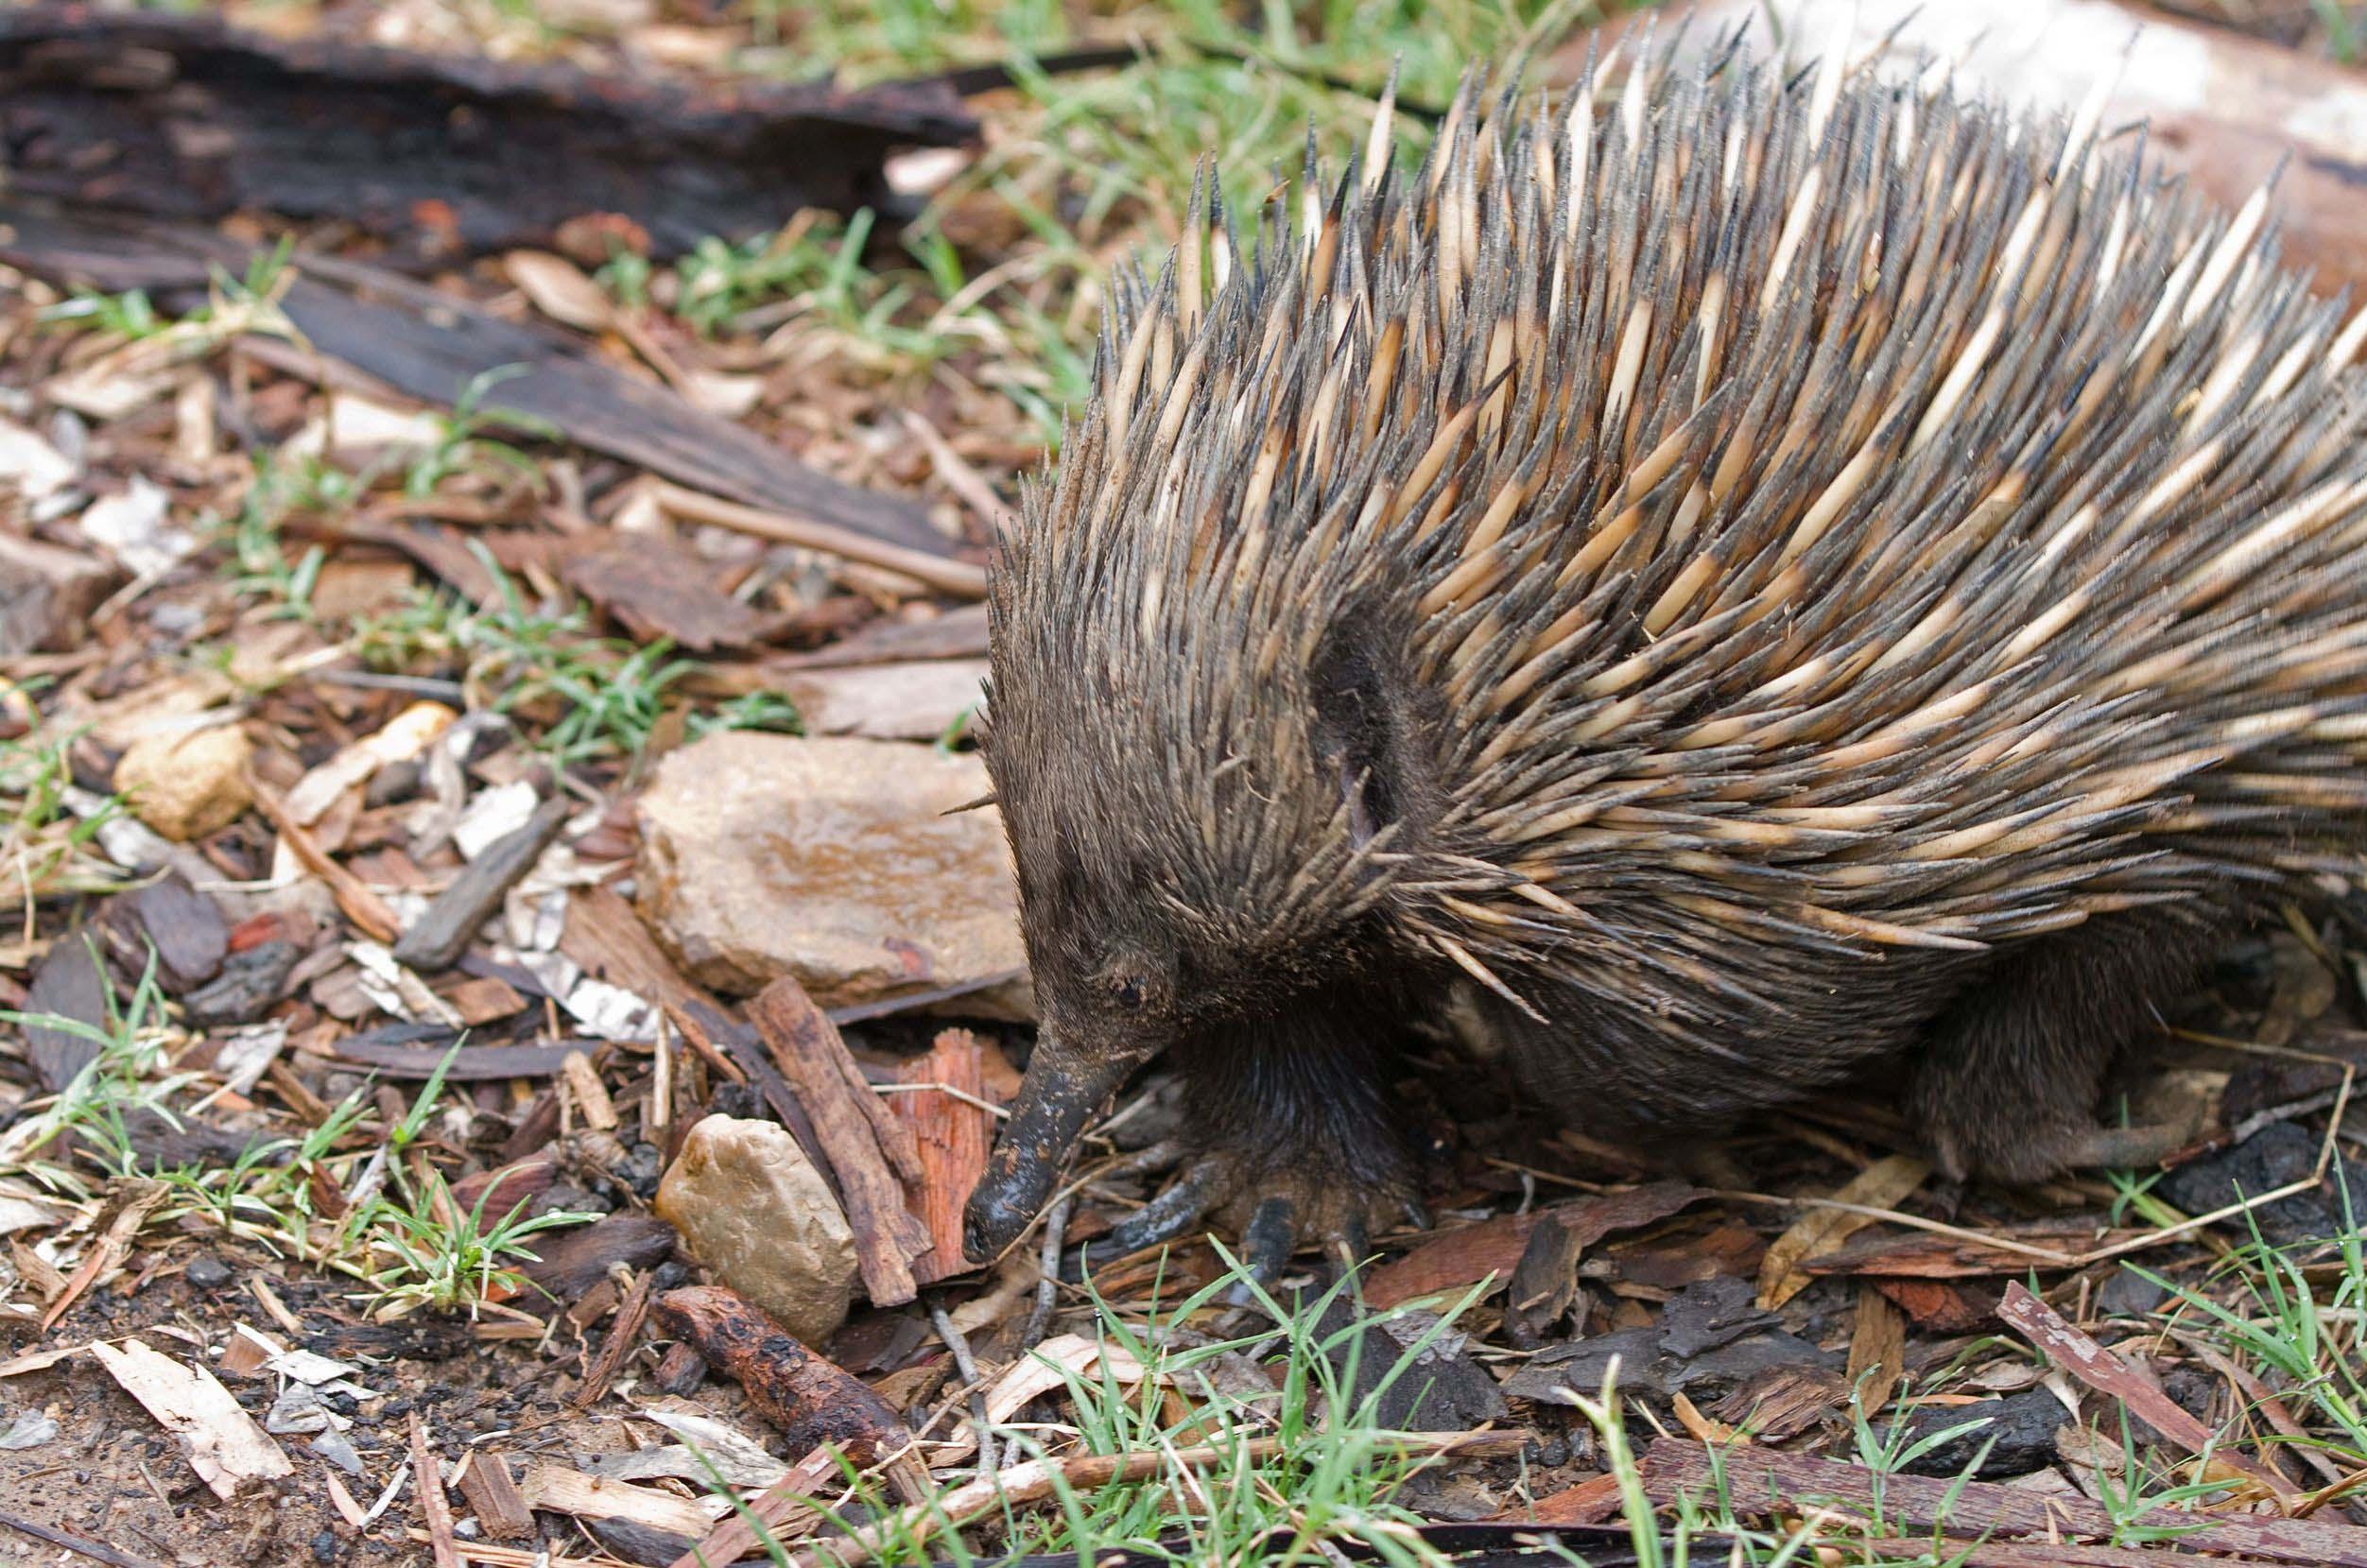 echidna-on-ground-australia